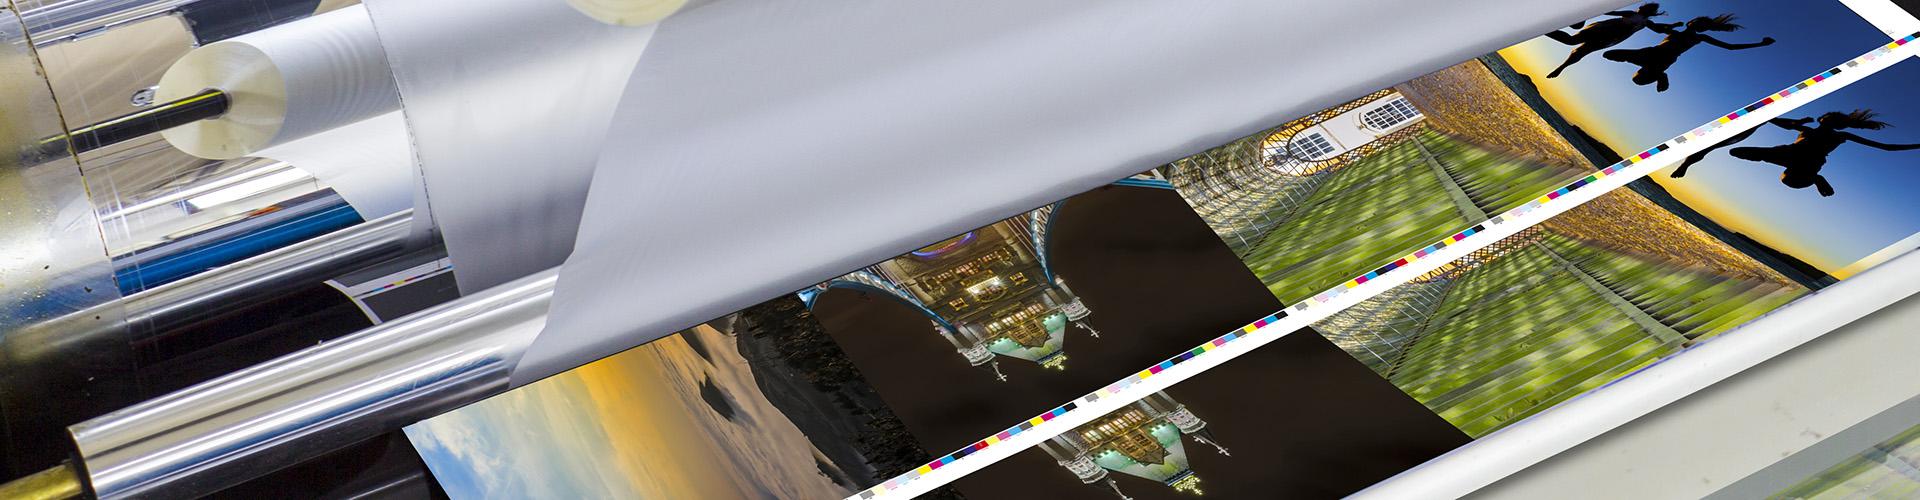 Baobab Printing Slide Background Image 1